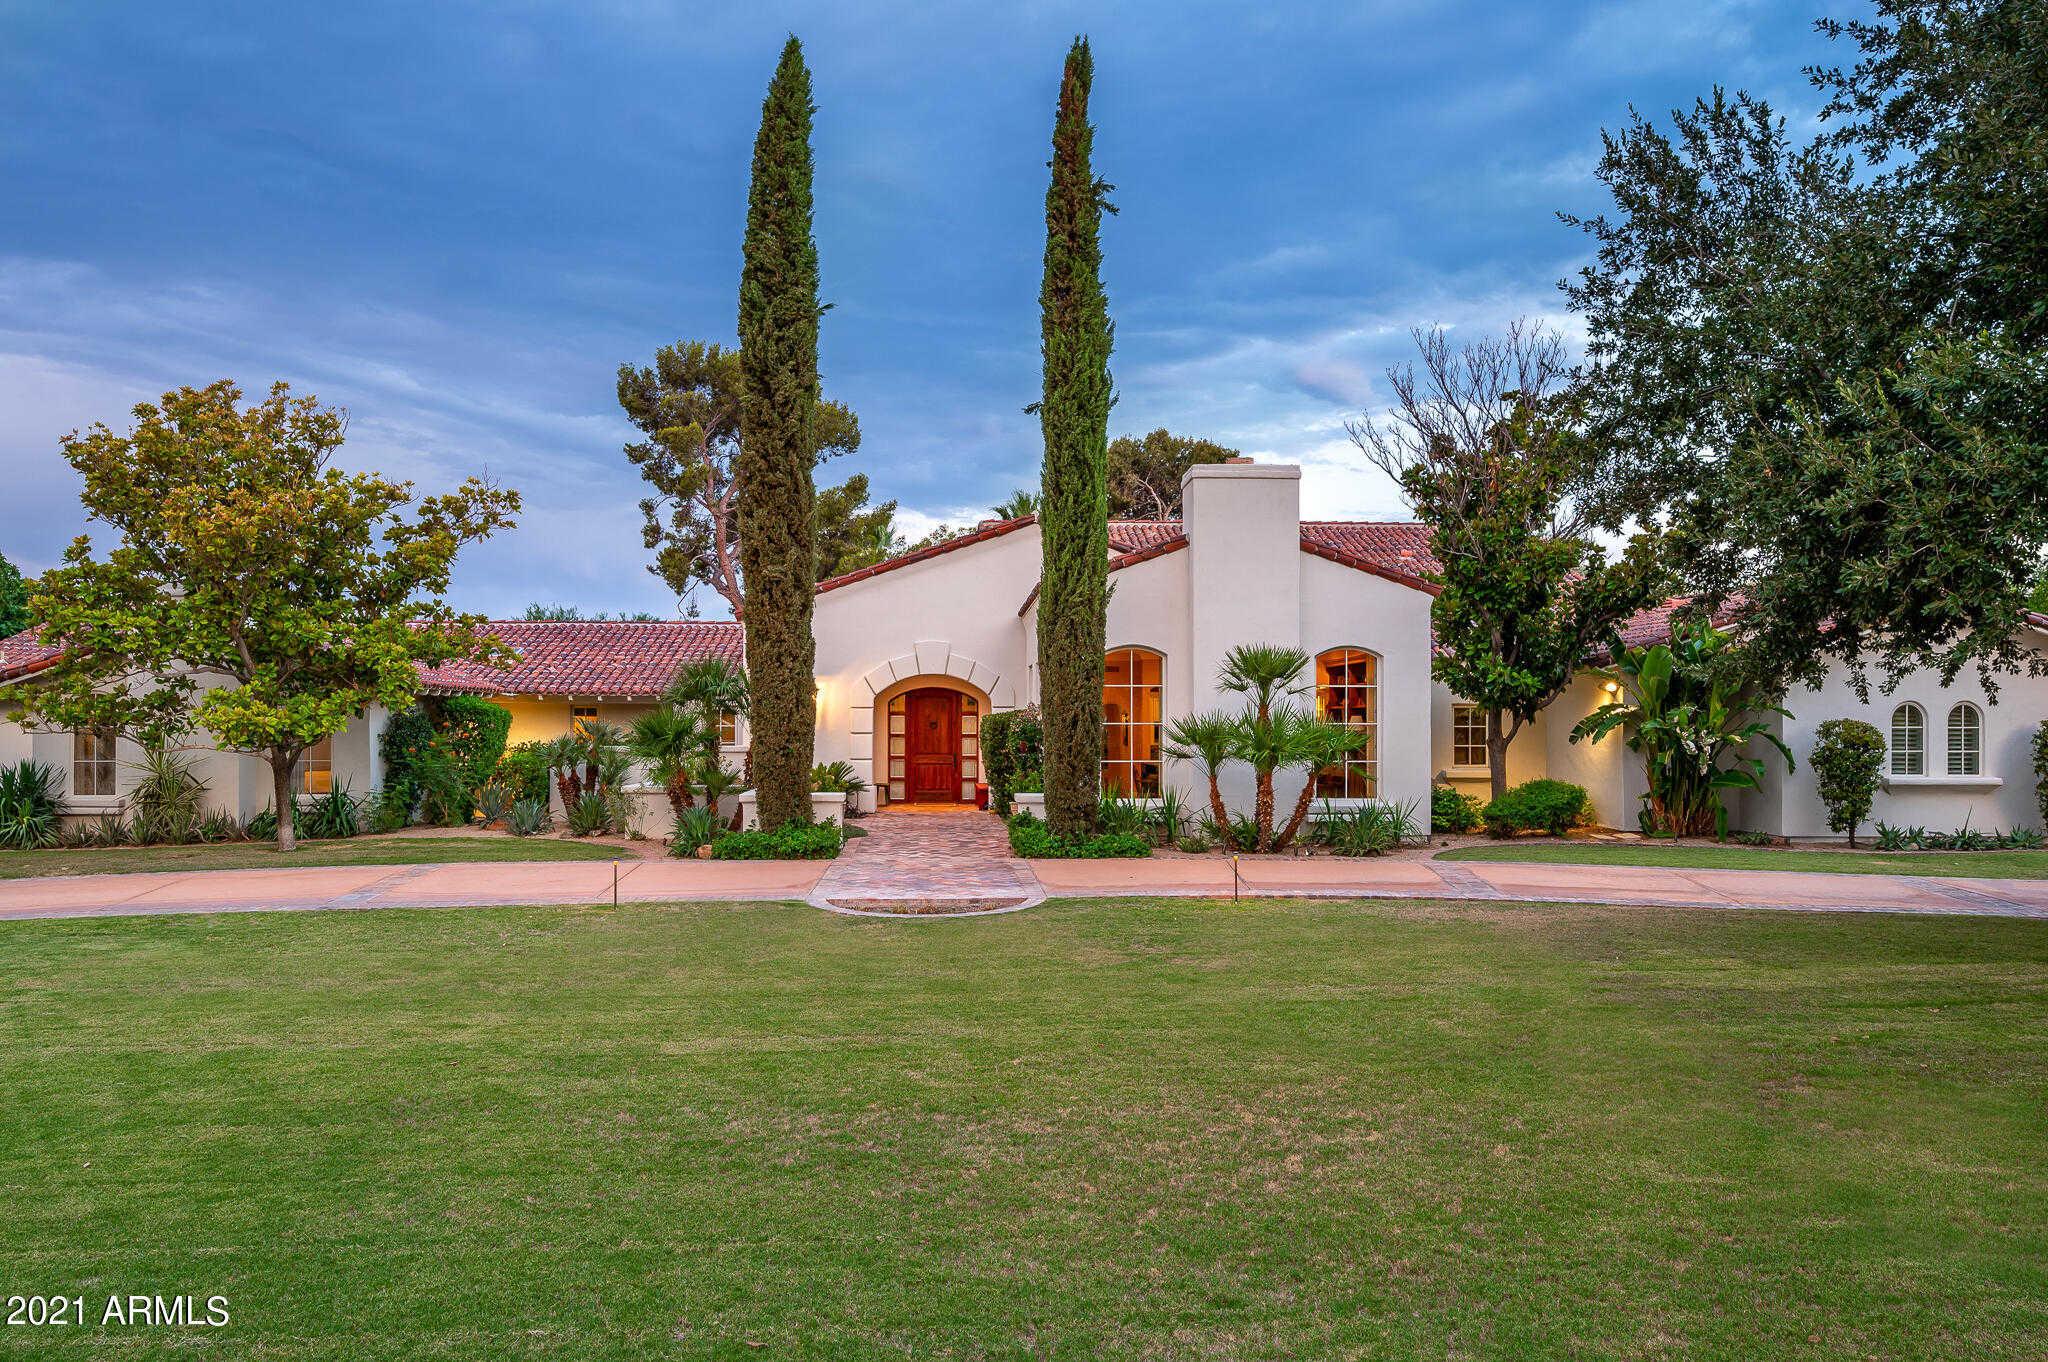 $4,850,000 - 6Br/6Ba - Home for Sale in Casa Blanca Estates, Paradise Valley